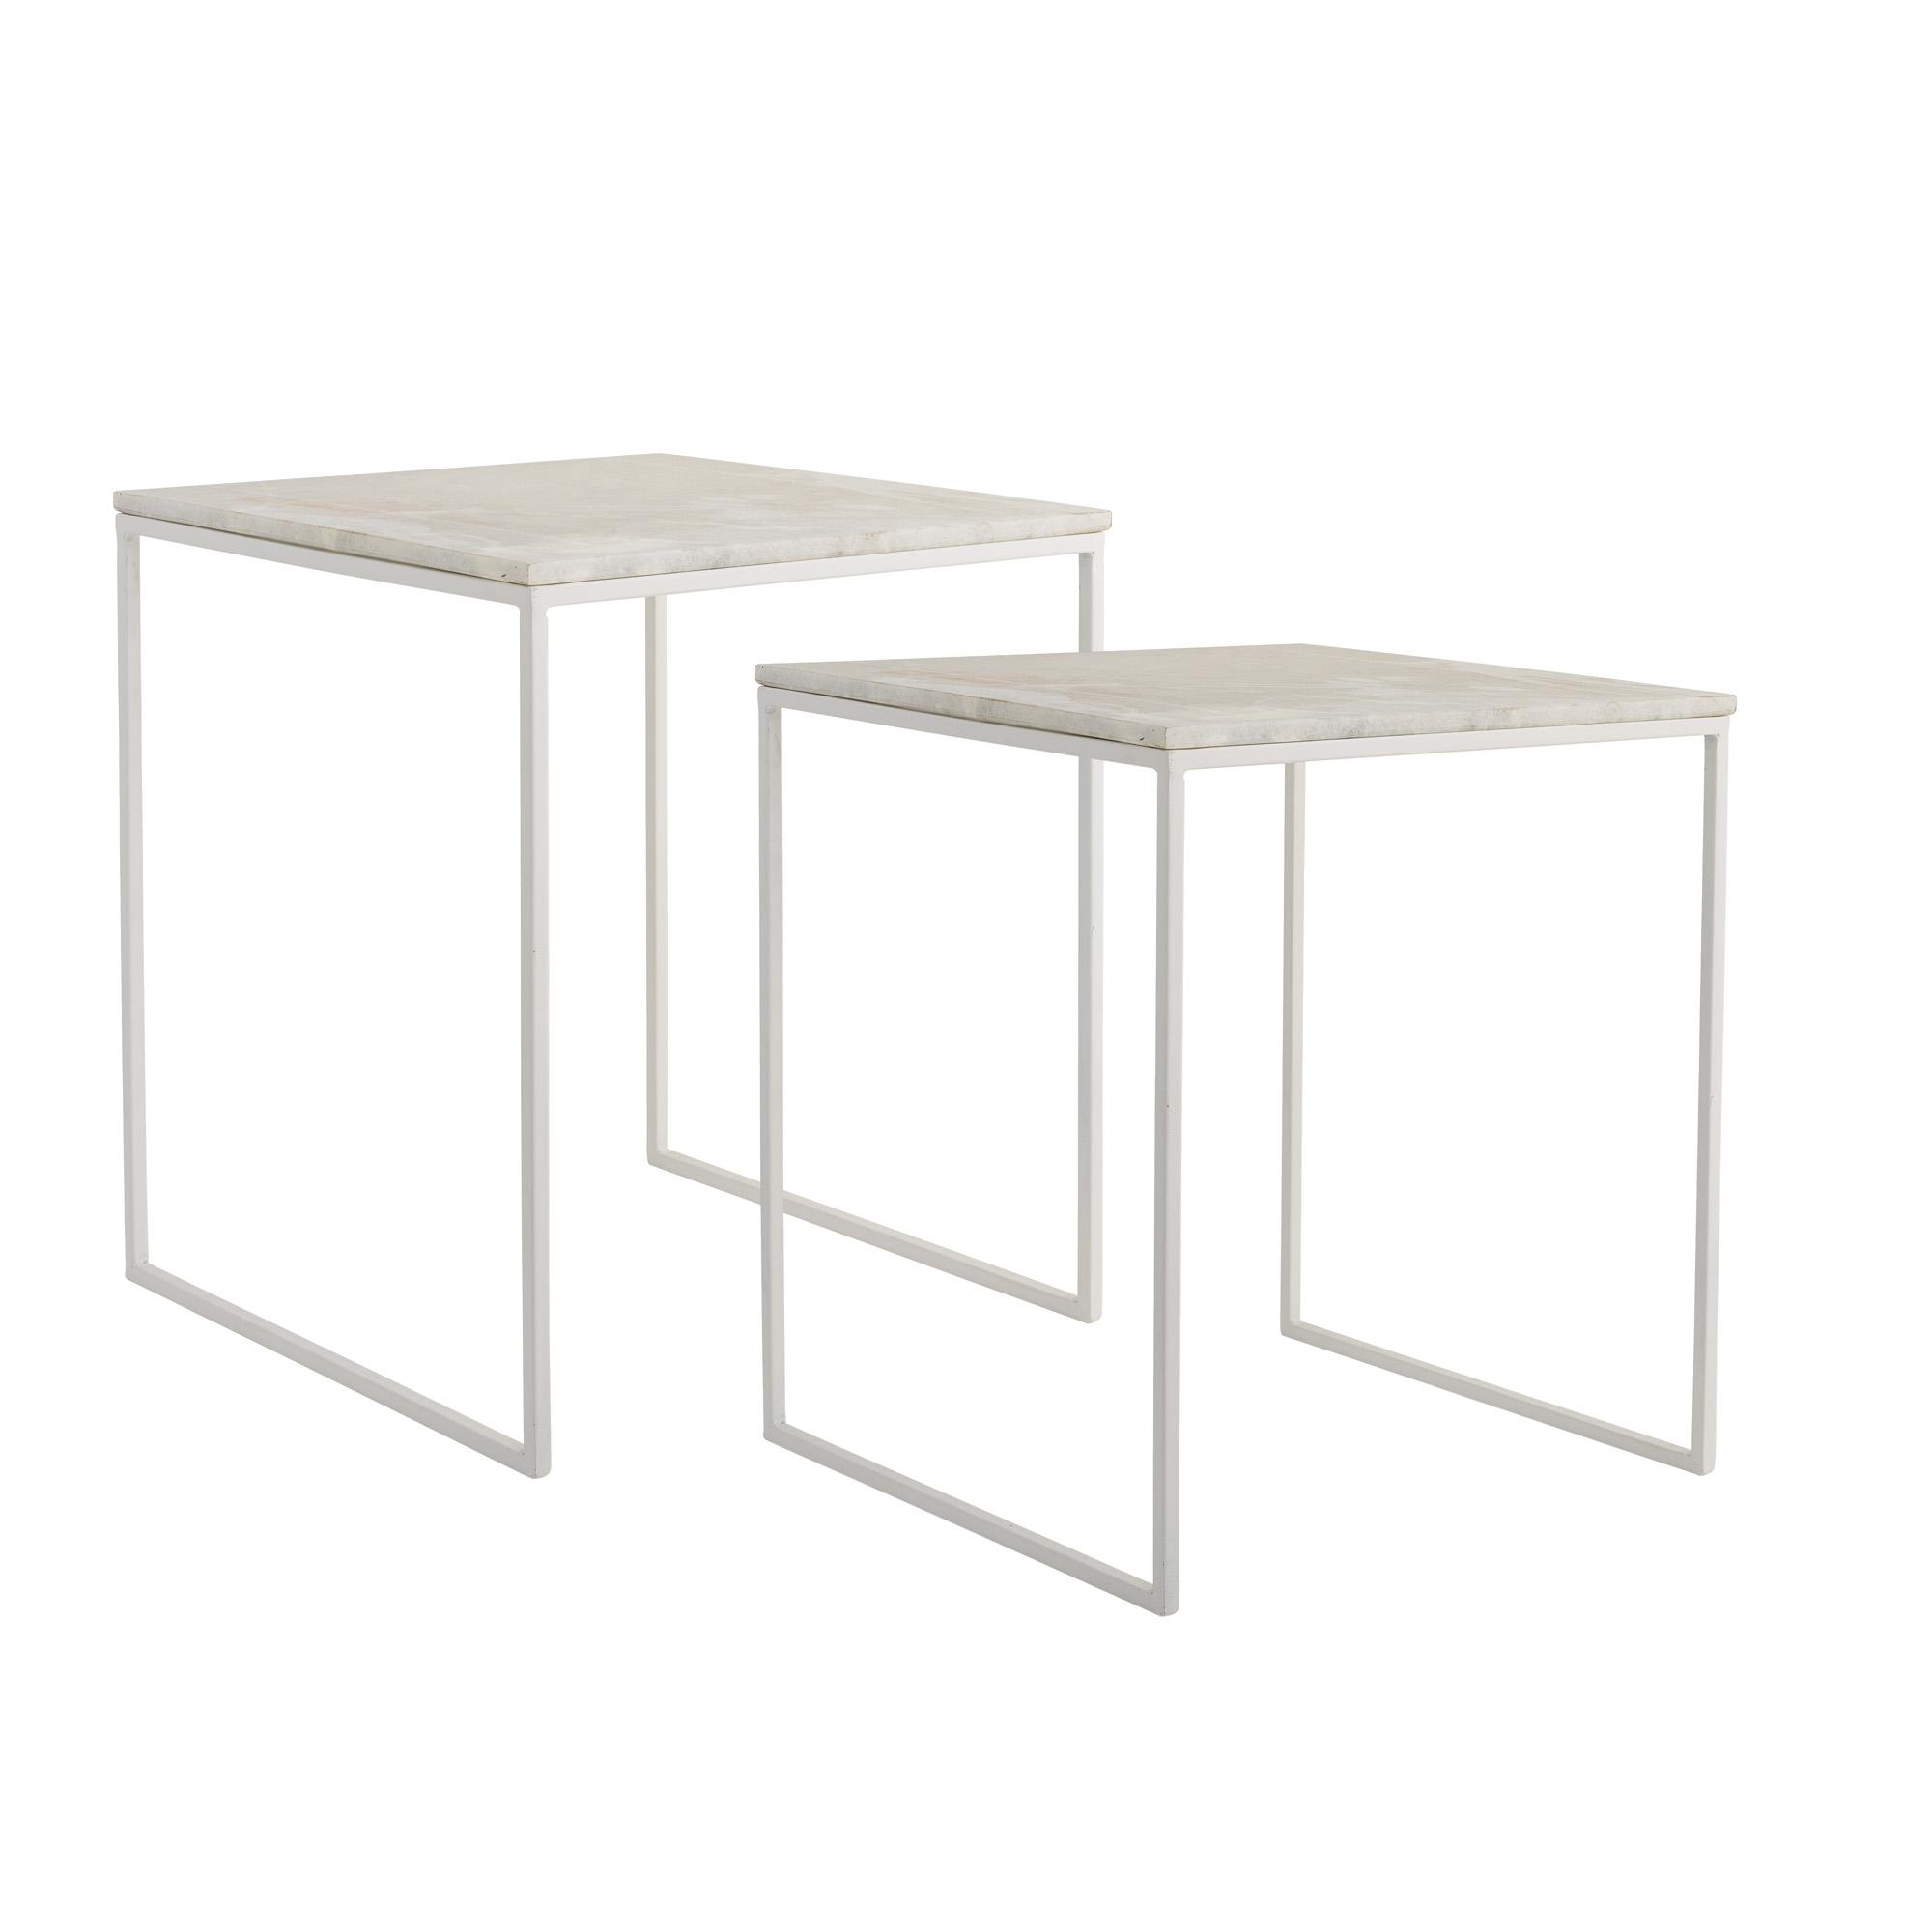 BLOOMINGVILLE Gavl sofabord - hvid jern/marmor, kvadratisk (sæt á 2)